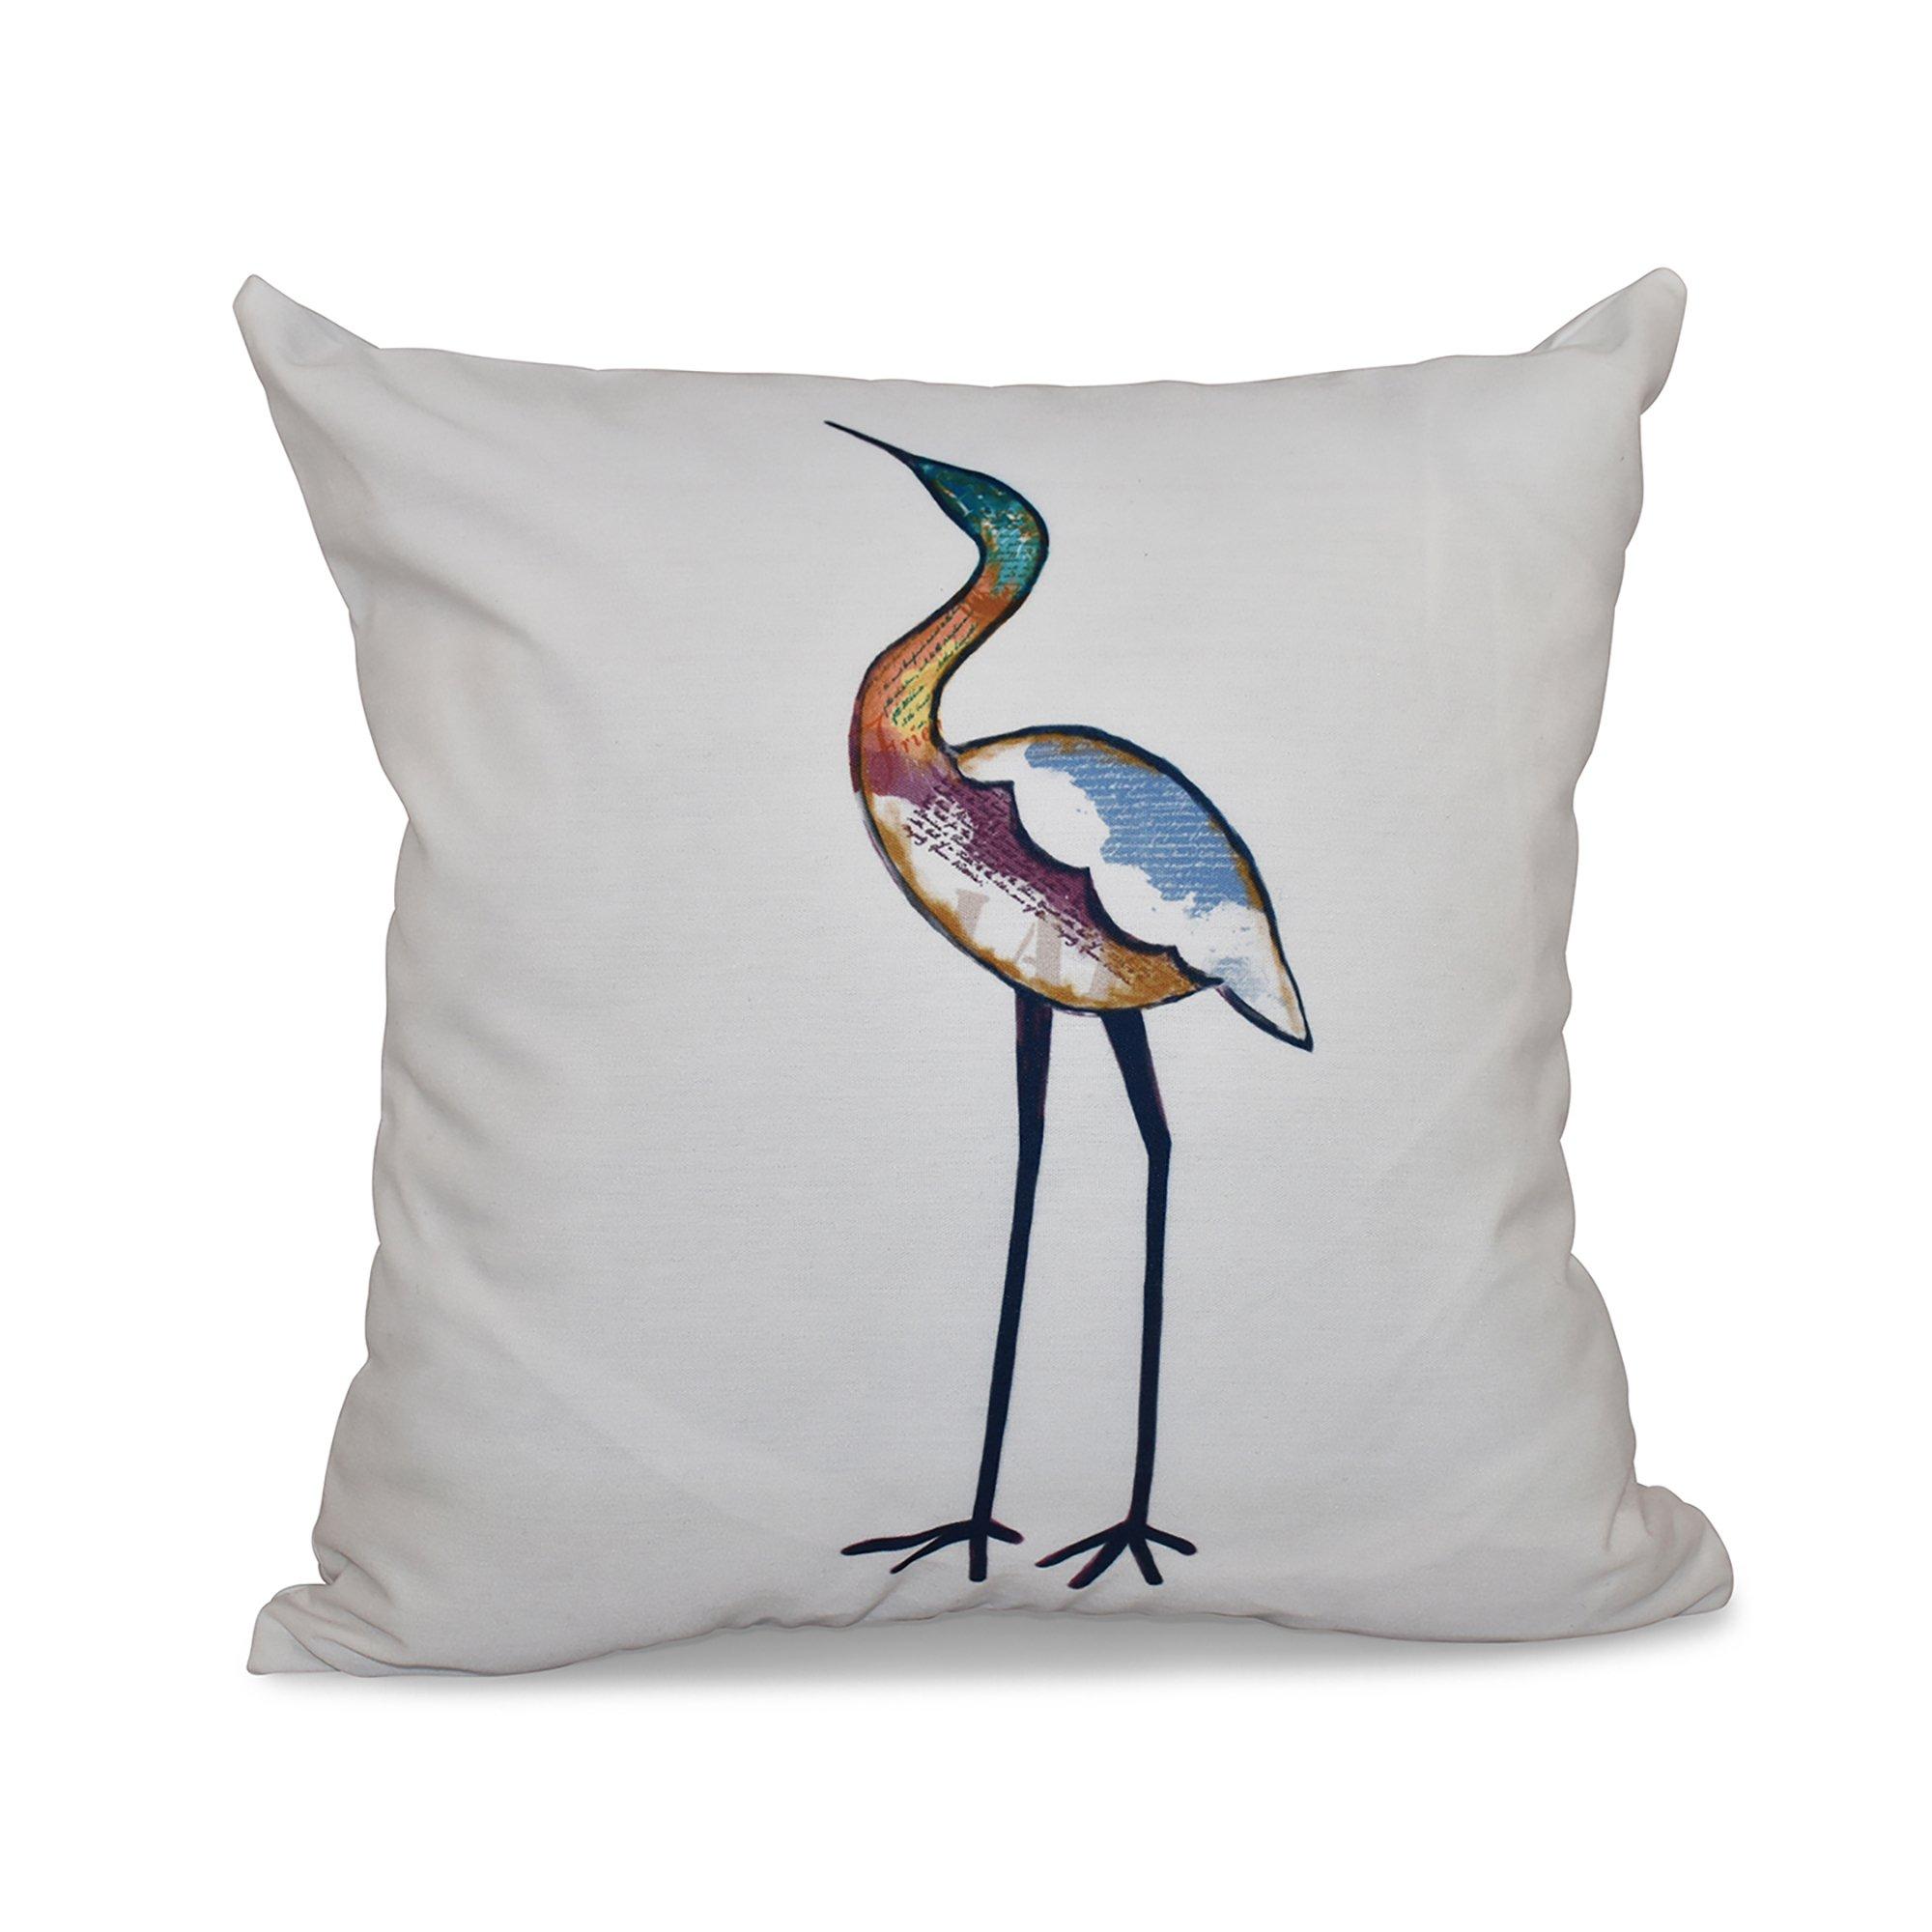 E by design 20 x 20 inch,Bird Fashion, Animal Print Pillow, White